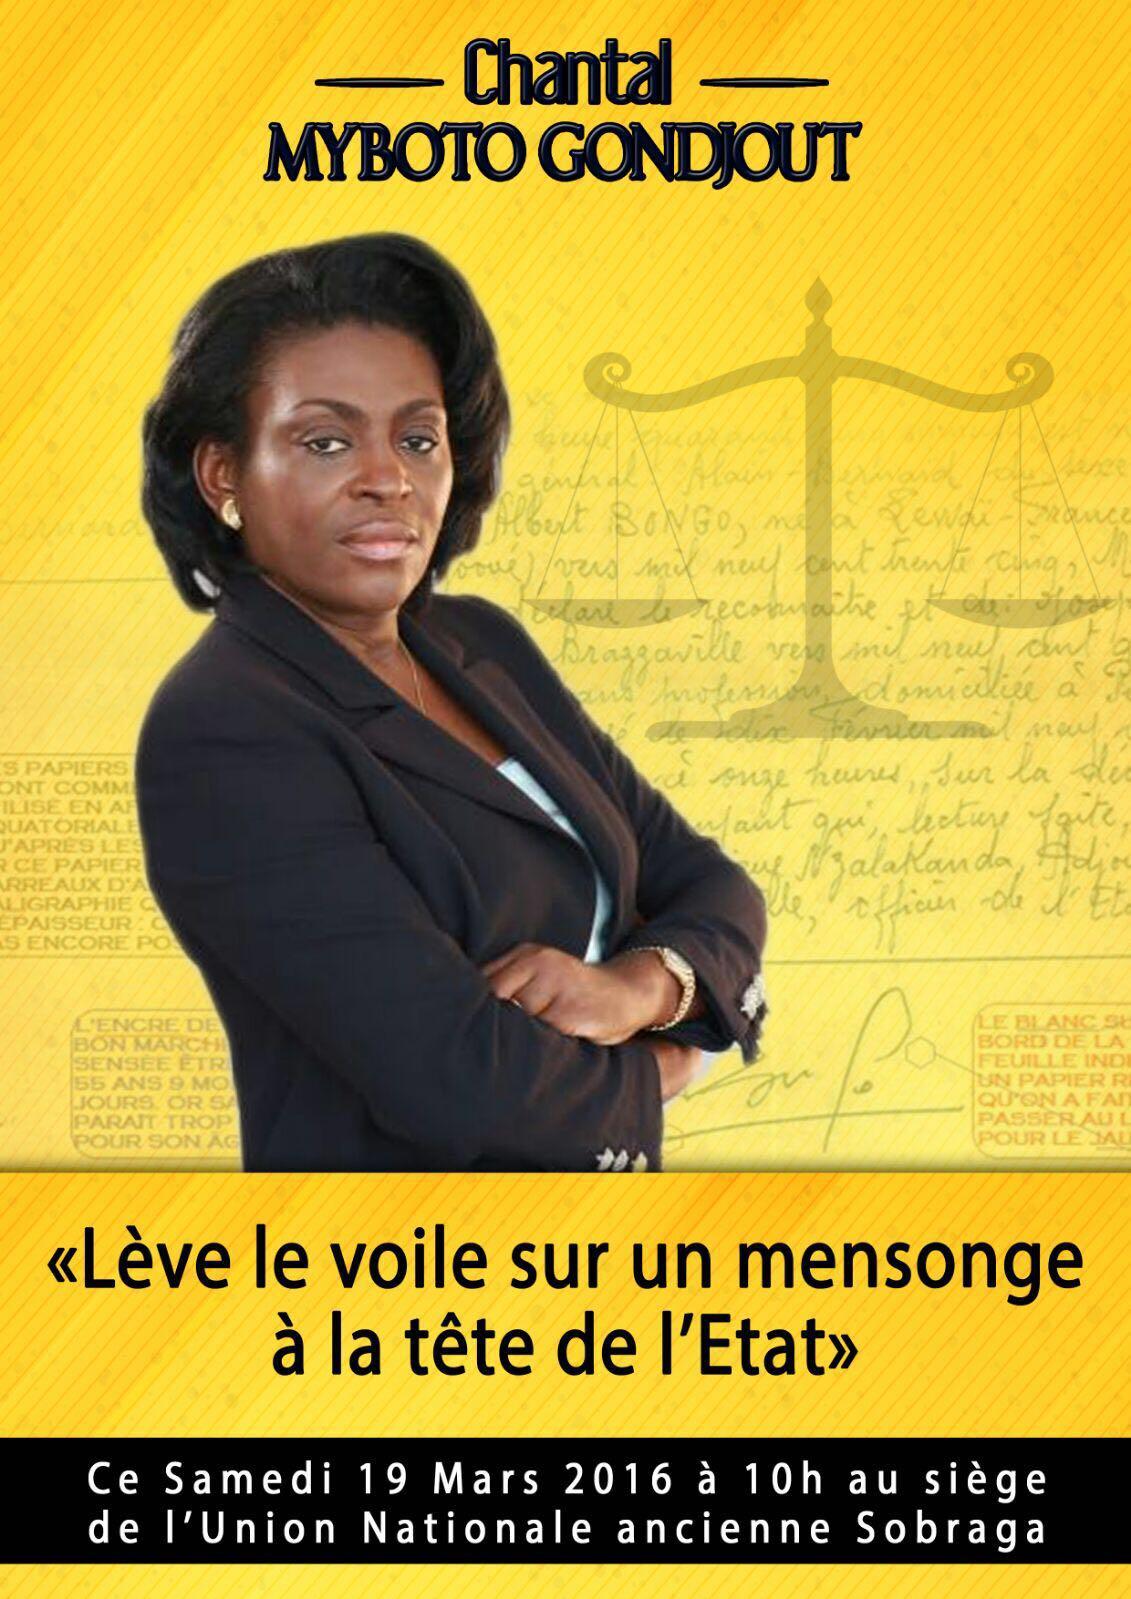 Chantal Myboto parle des secrets d'Etat samedi